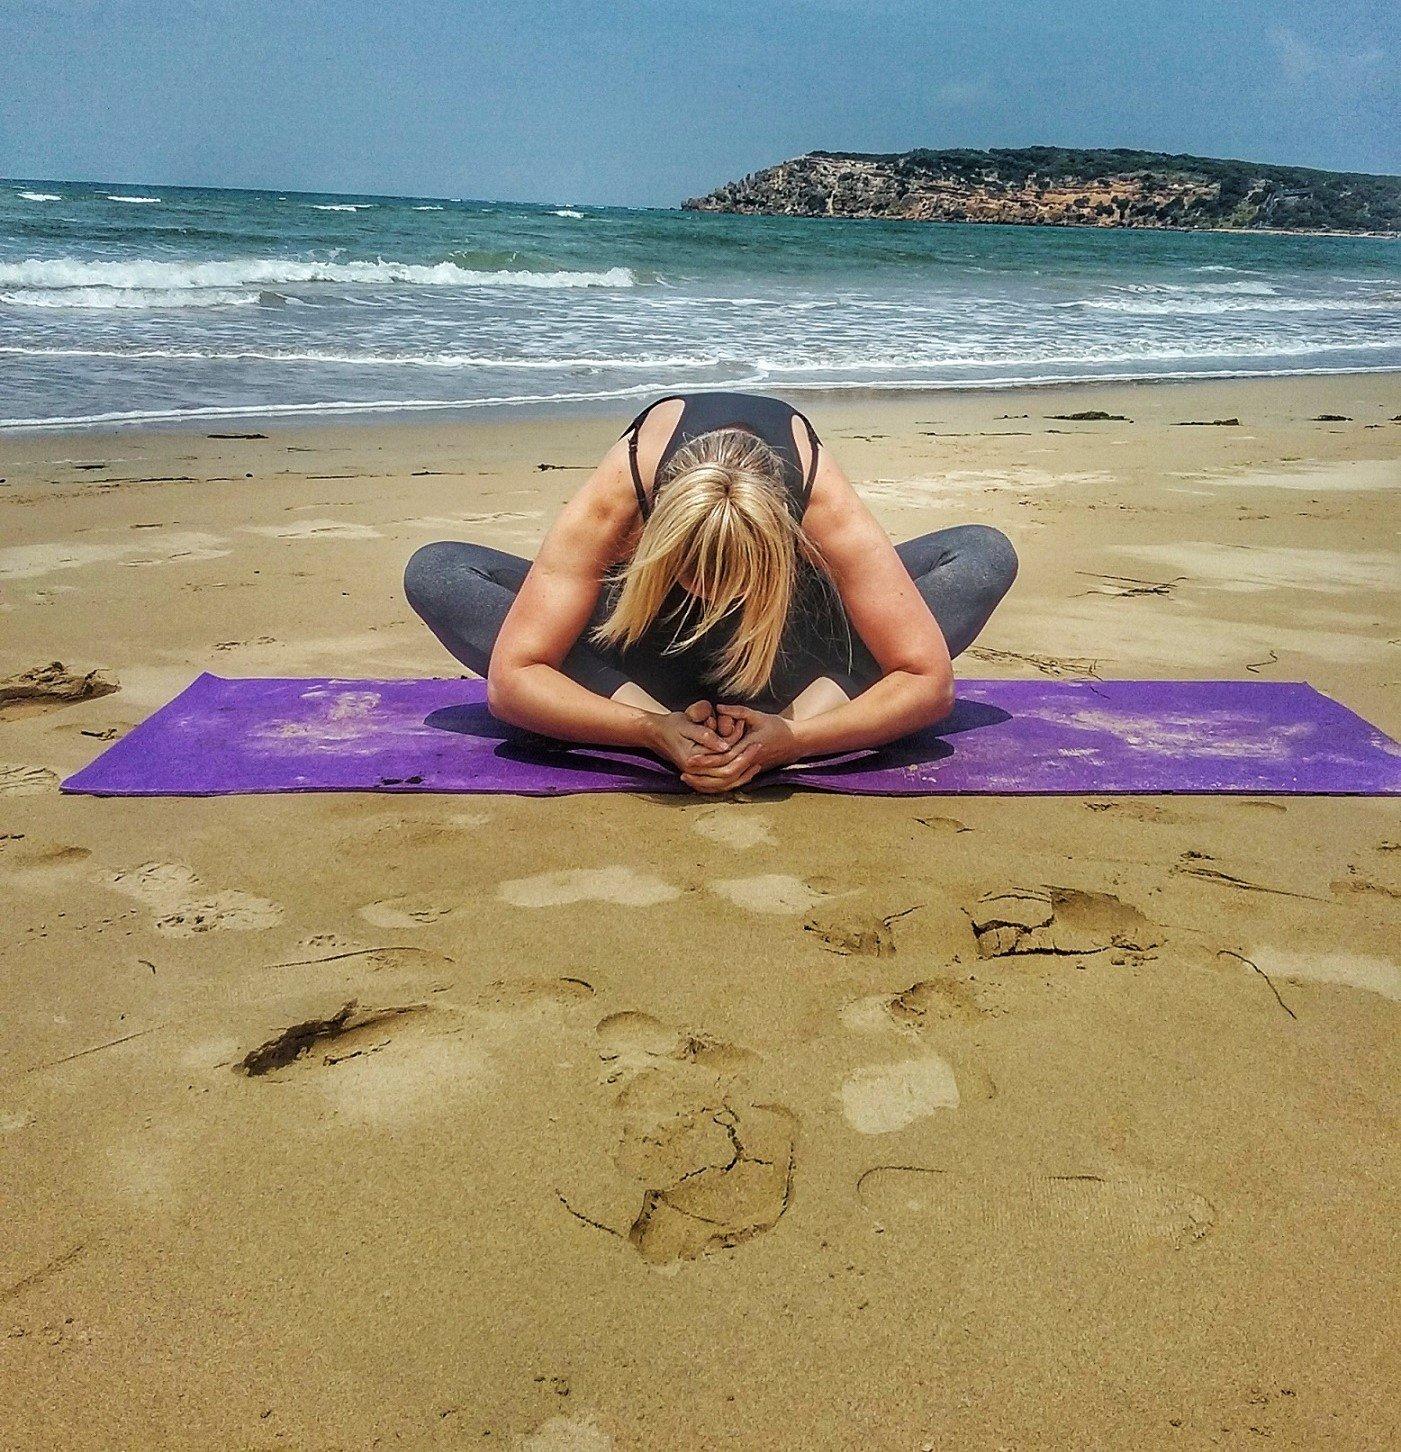 Yoga That Body & Mind | Style & Life by Susana